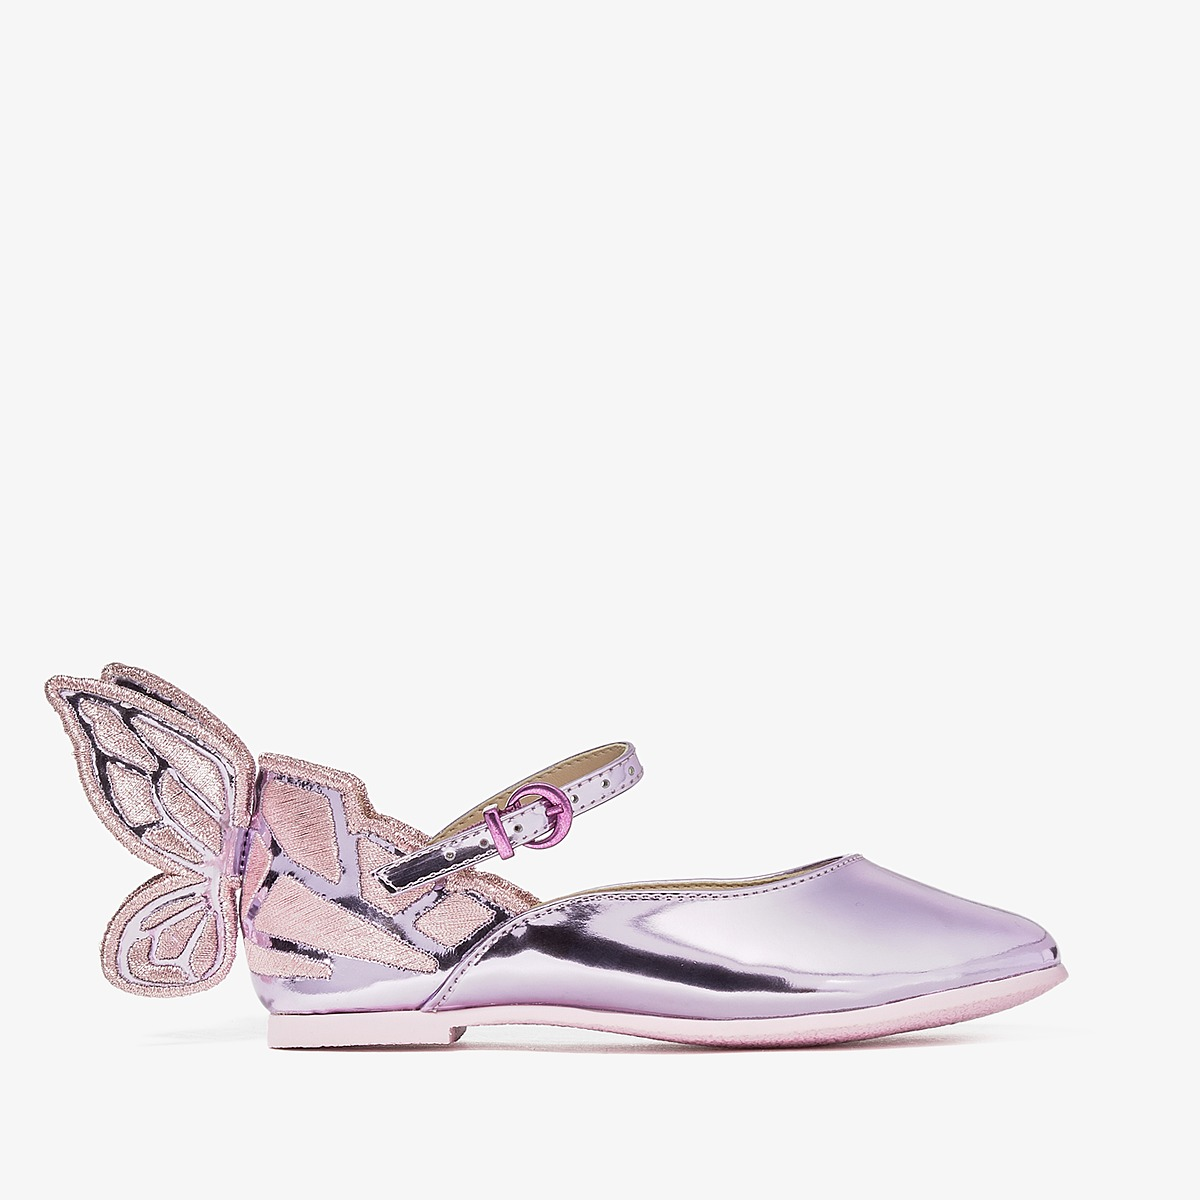 Sophia Webster - Chiara Embroidery (Toddler/Little Kid) (Rosa Metallic) Girls Shoes